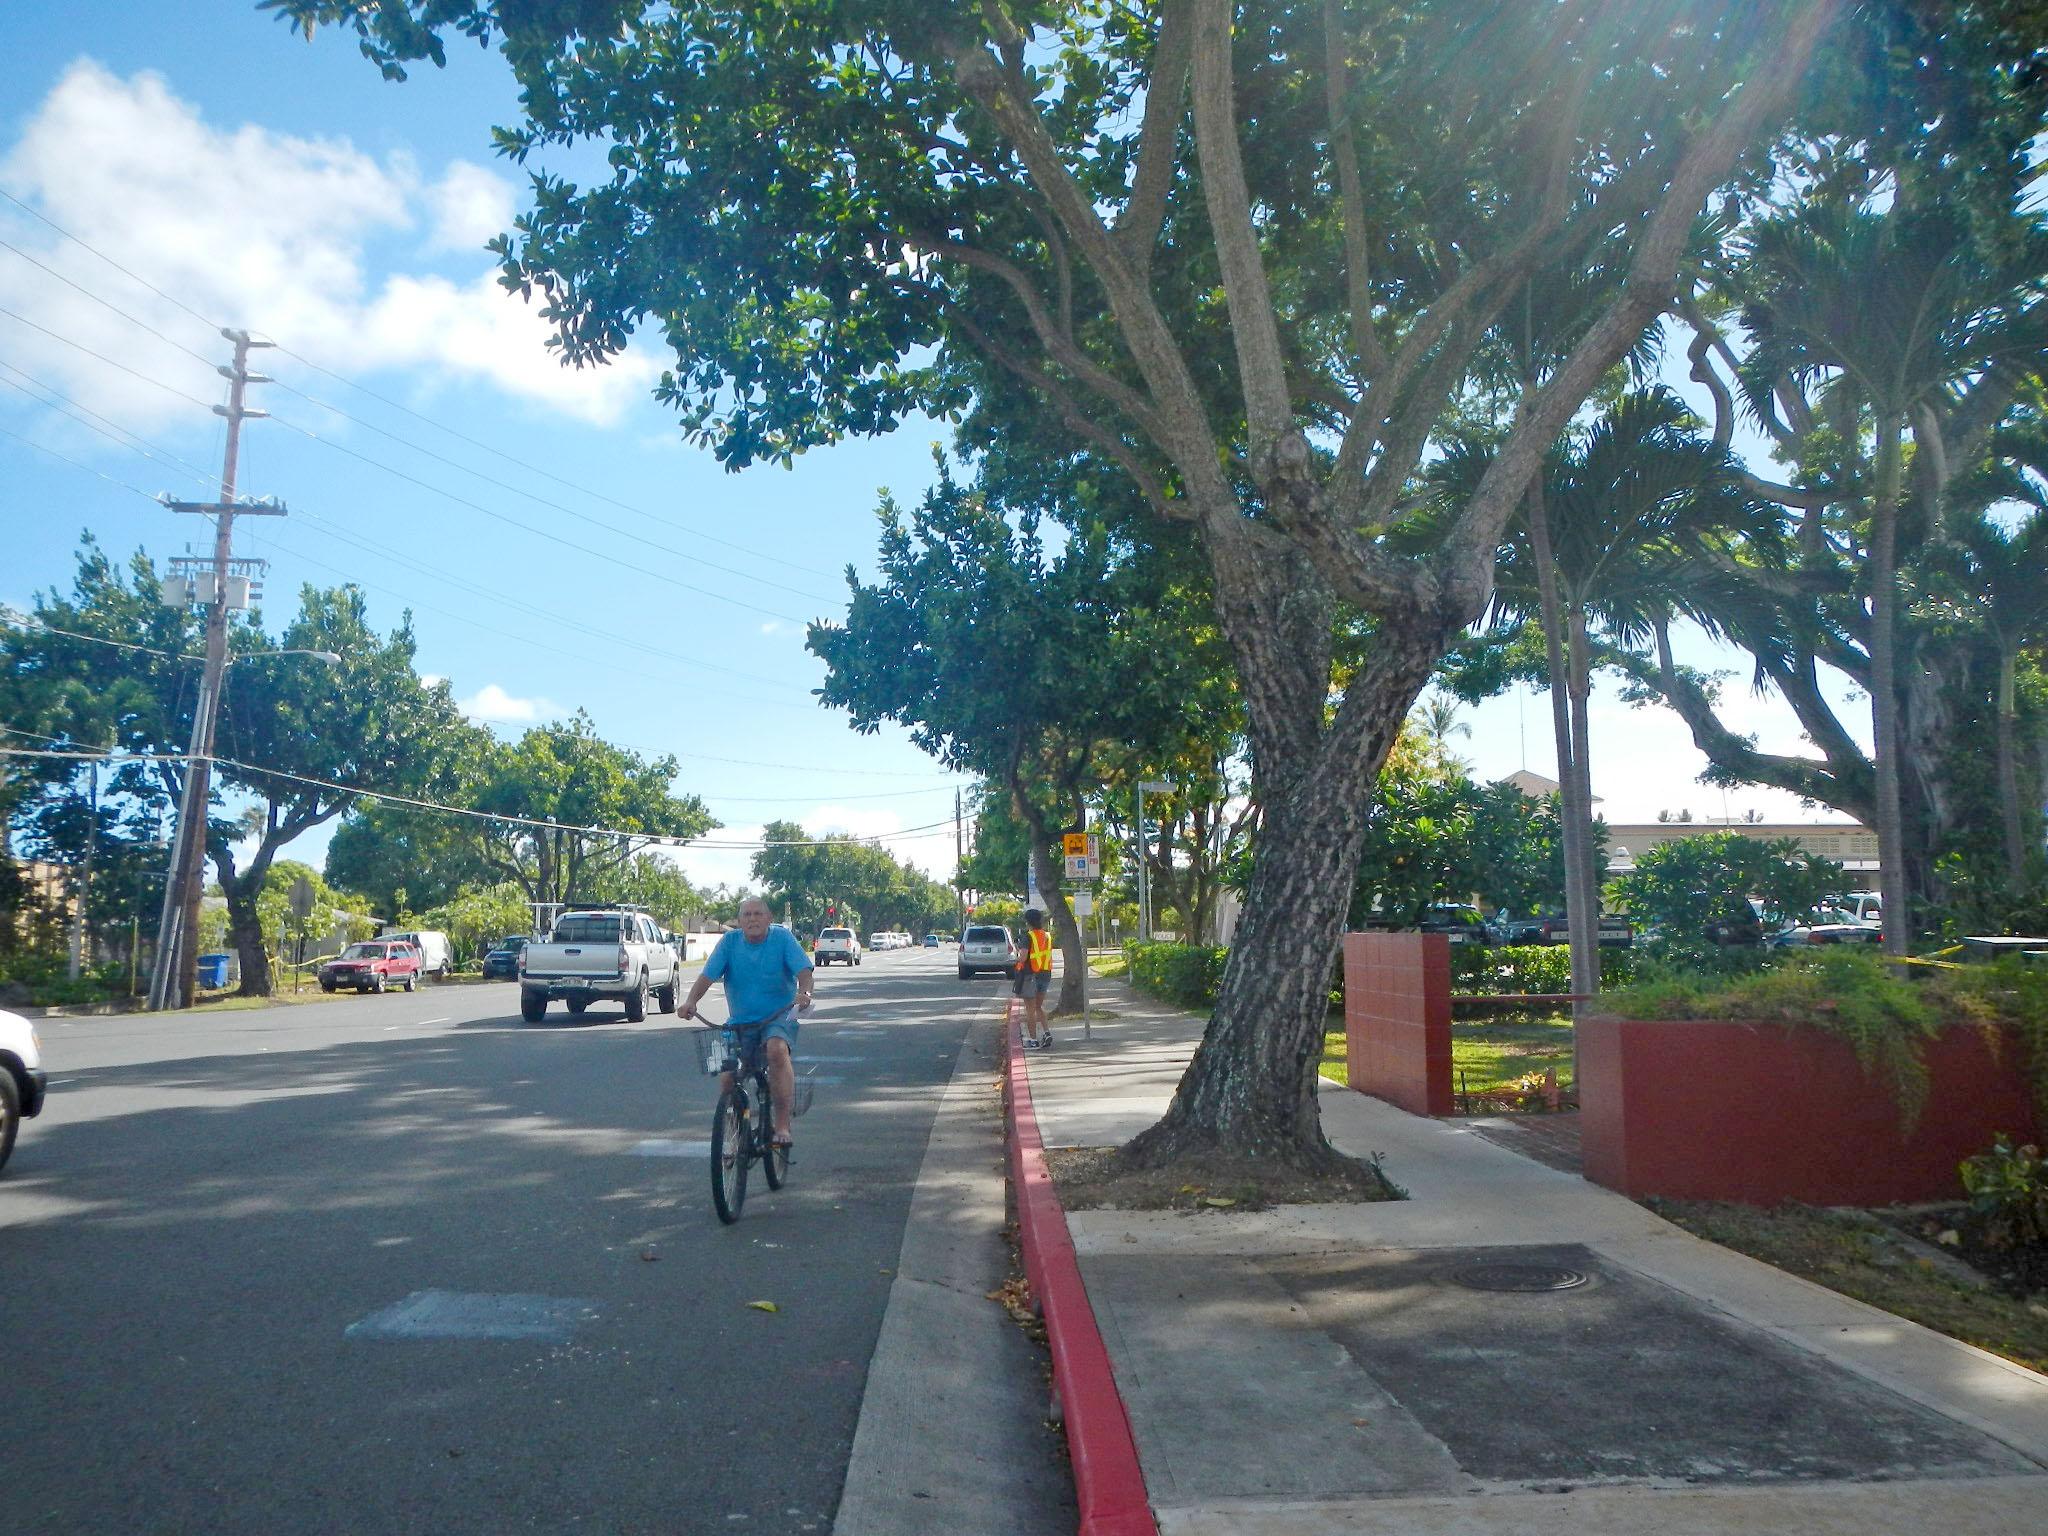 Kailua Kailua Road Map on lahaina road map, oakland road map, kapaa road map, lihue road map, waikiki road map, oahu road map, hamakua road map, kona road map, alexandria road map, north shore road map, pauoa road map, honolulu road map, jackson road map, hilo road map, waikoloa road map, hawaiian islands road map, wheeler army airfield road map, long beach road map, rochester road map, kalaeloa airport road map,